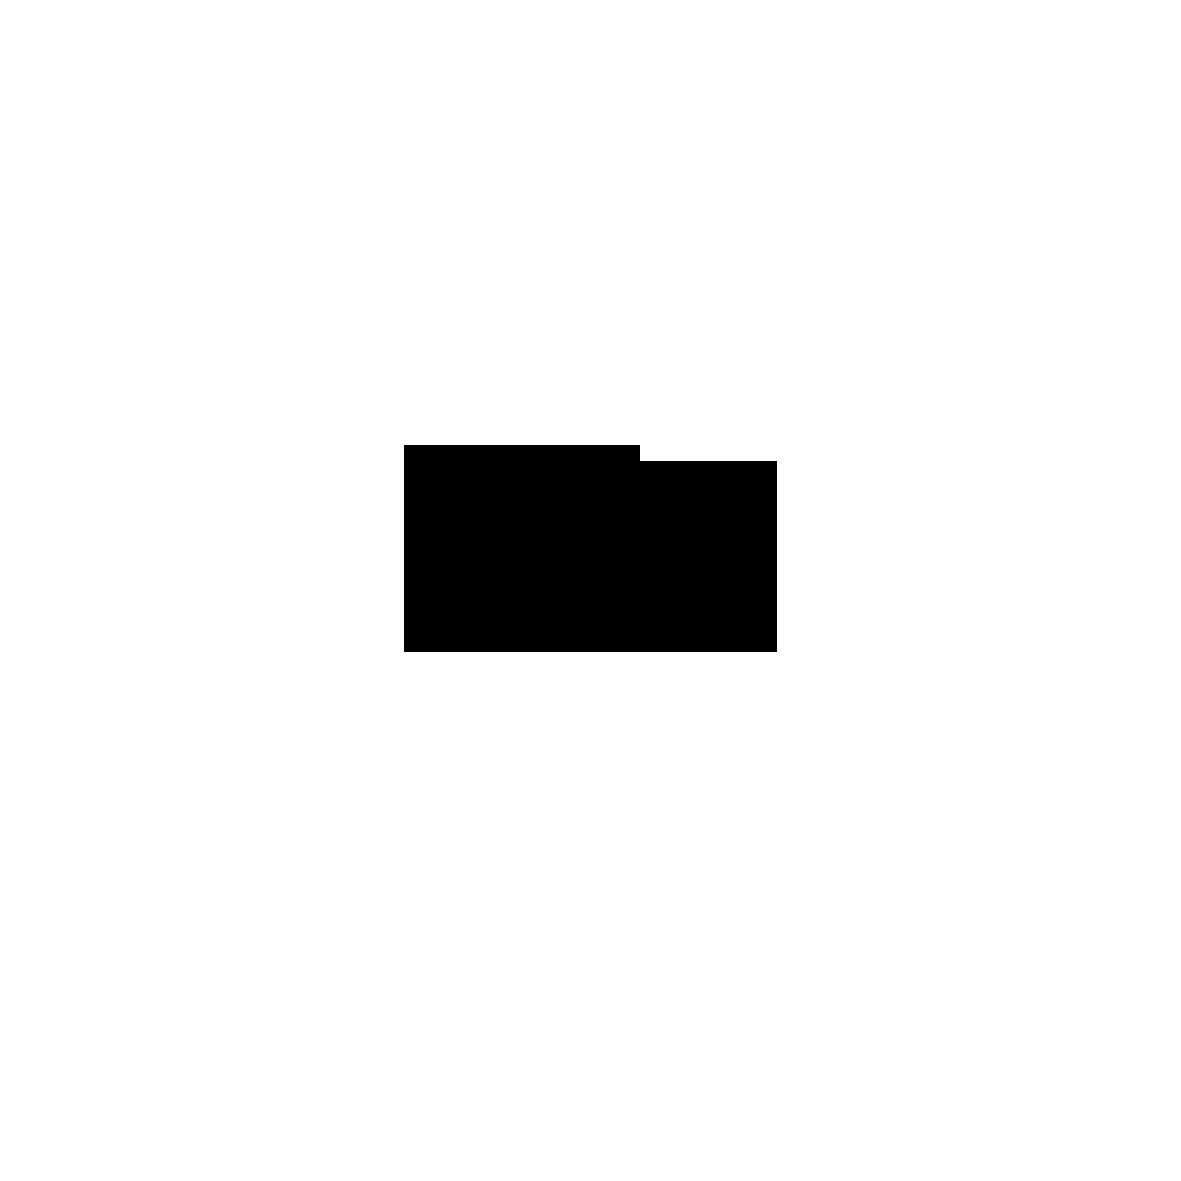 Sky-city-logo.png